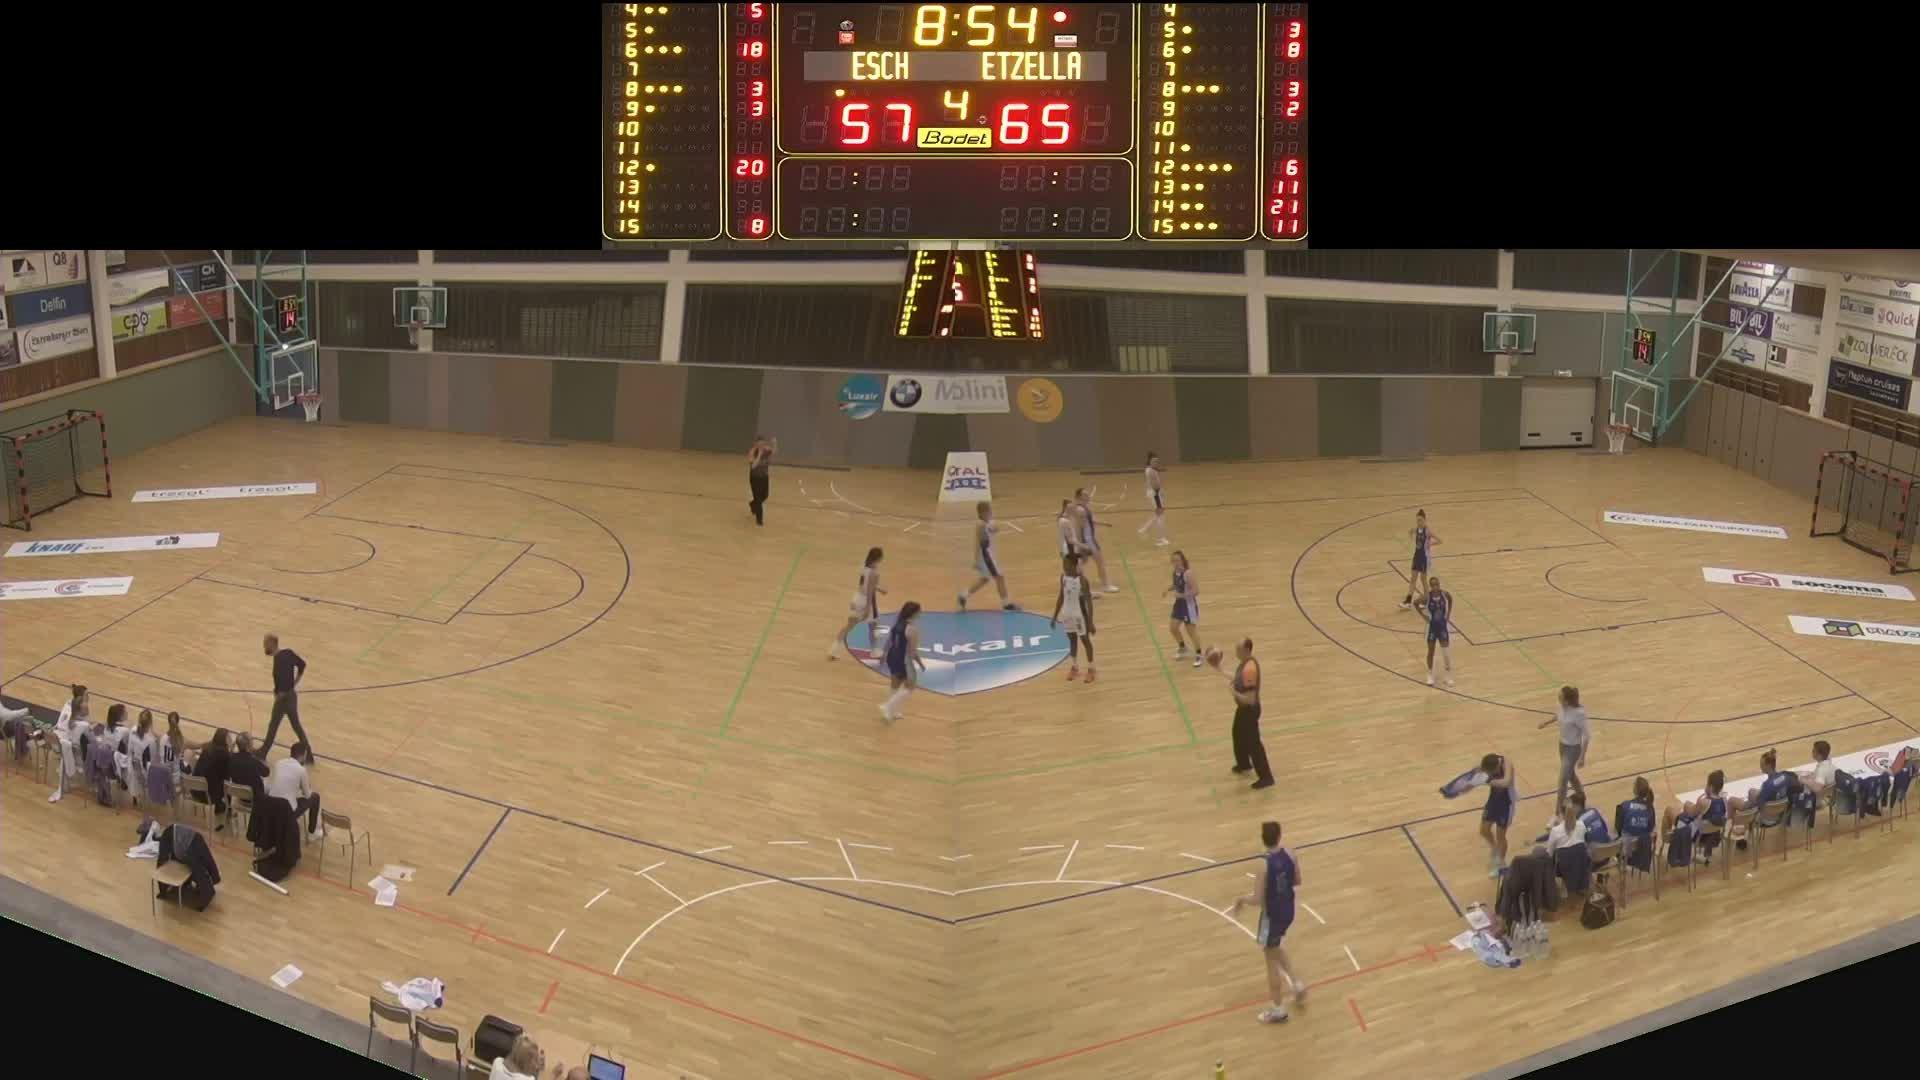 Basket Esch ( Dames A ) - Etzella - 24.01.2020